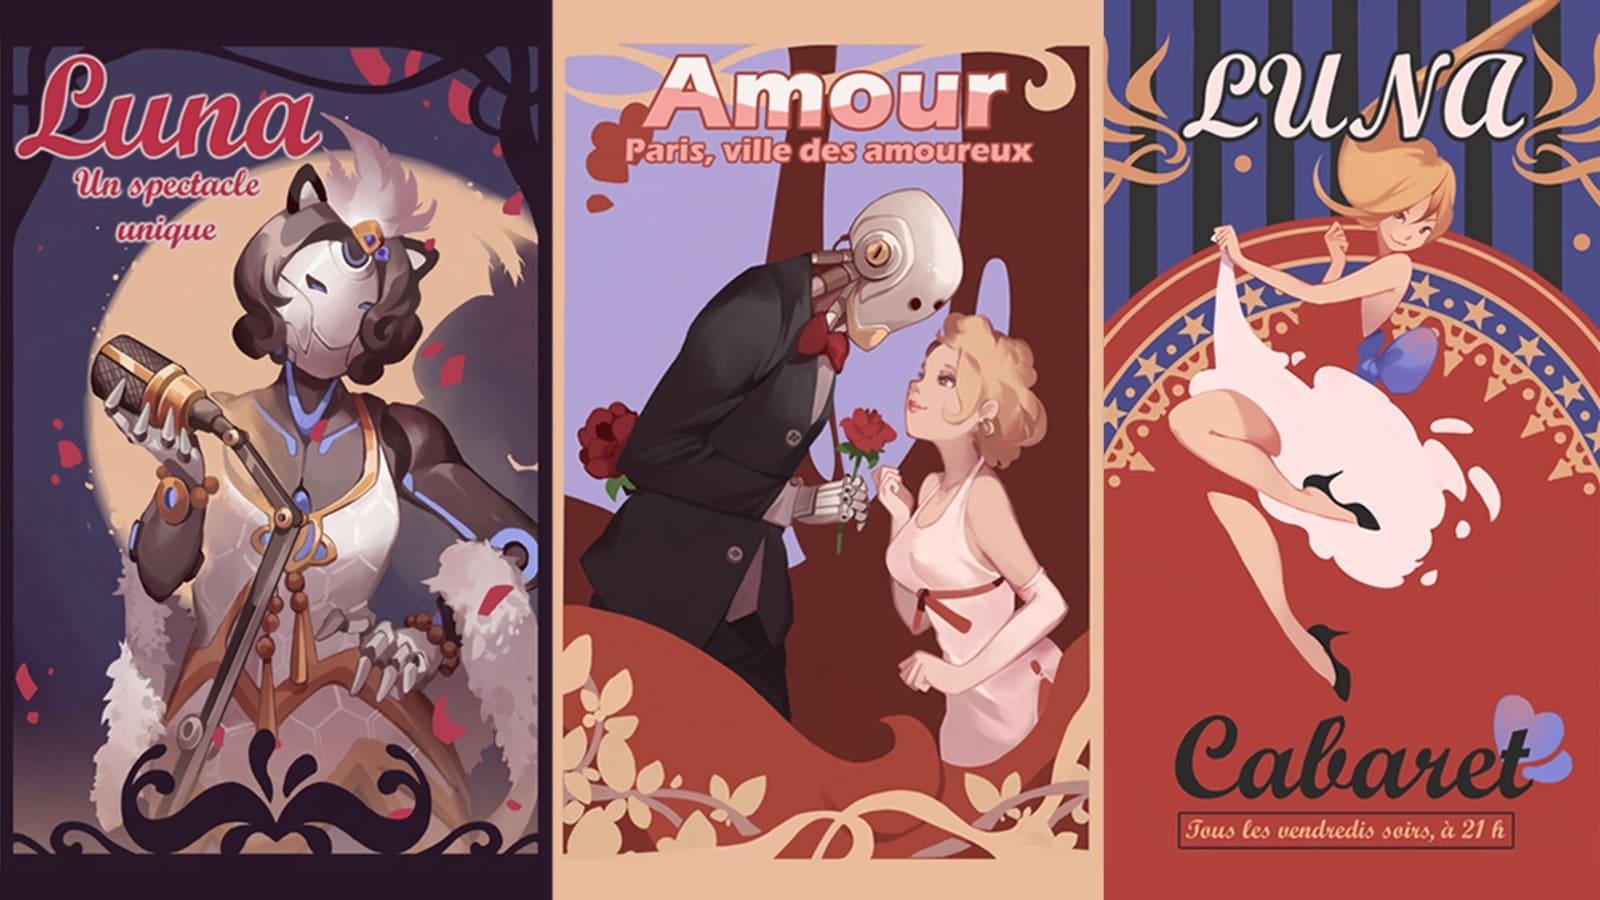 Overwatch Paris posters